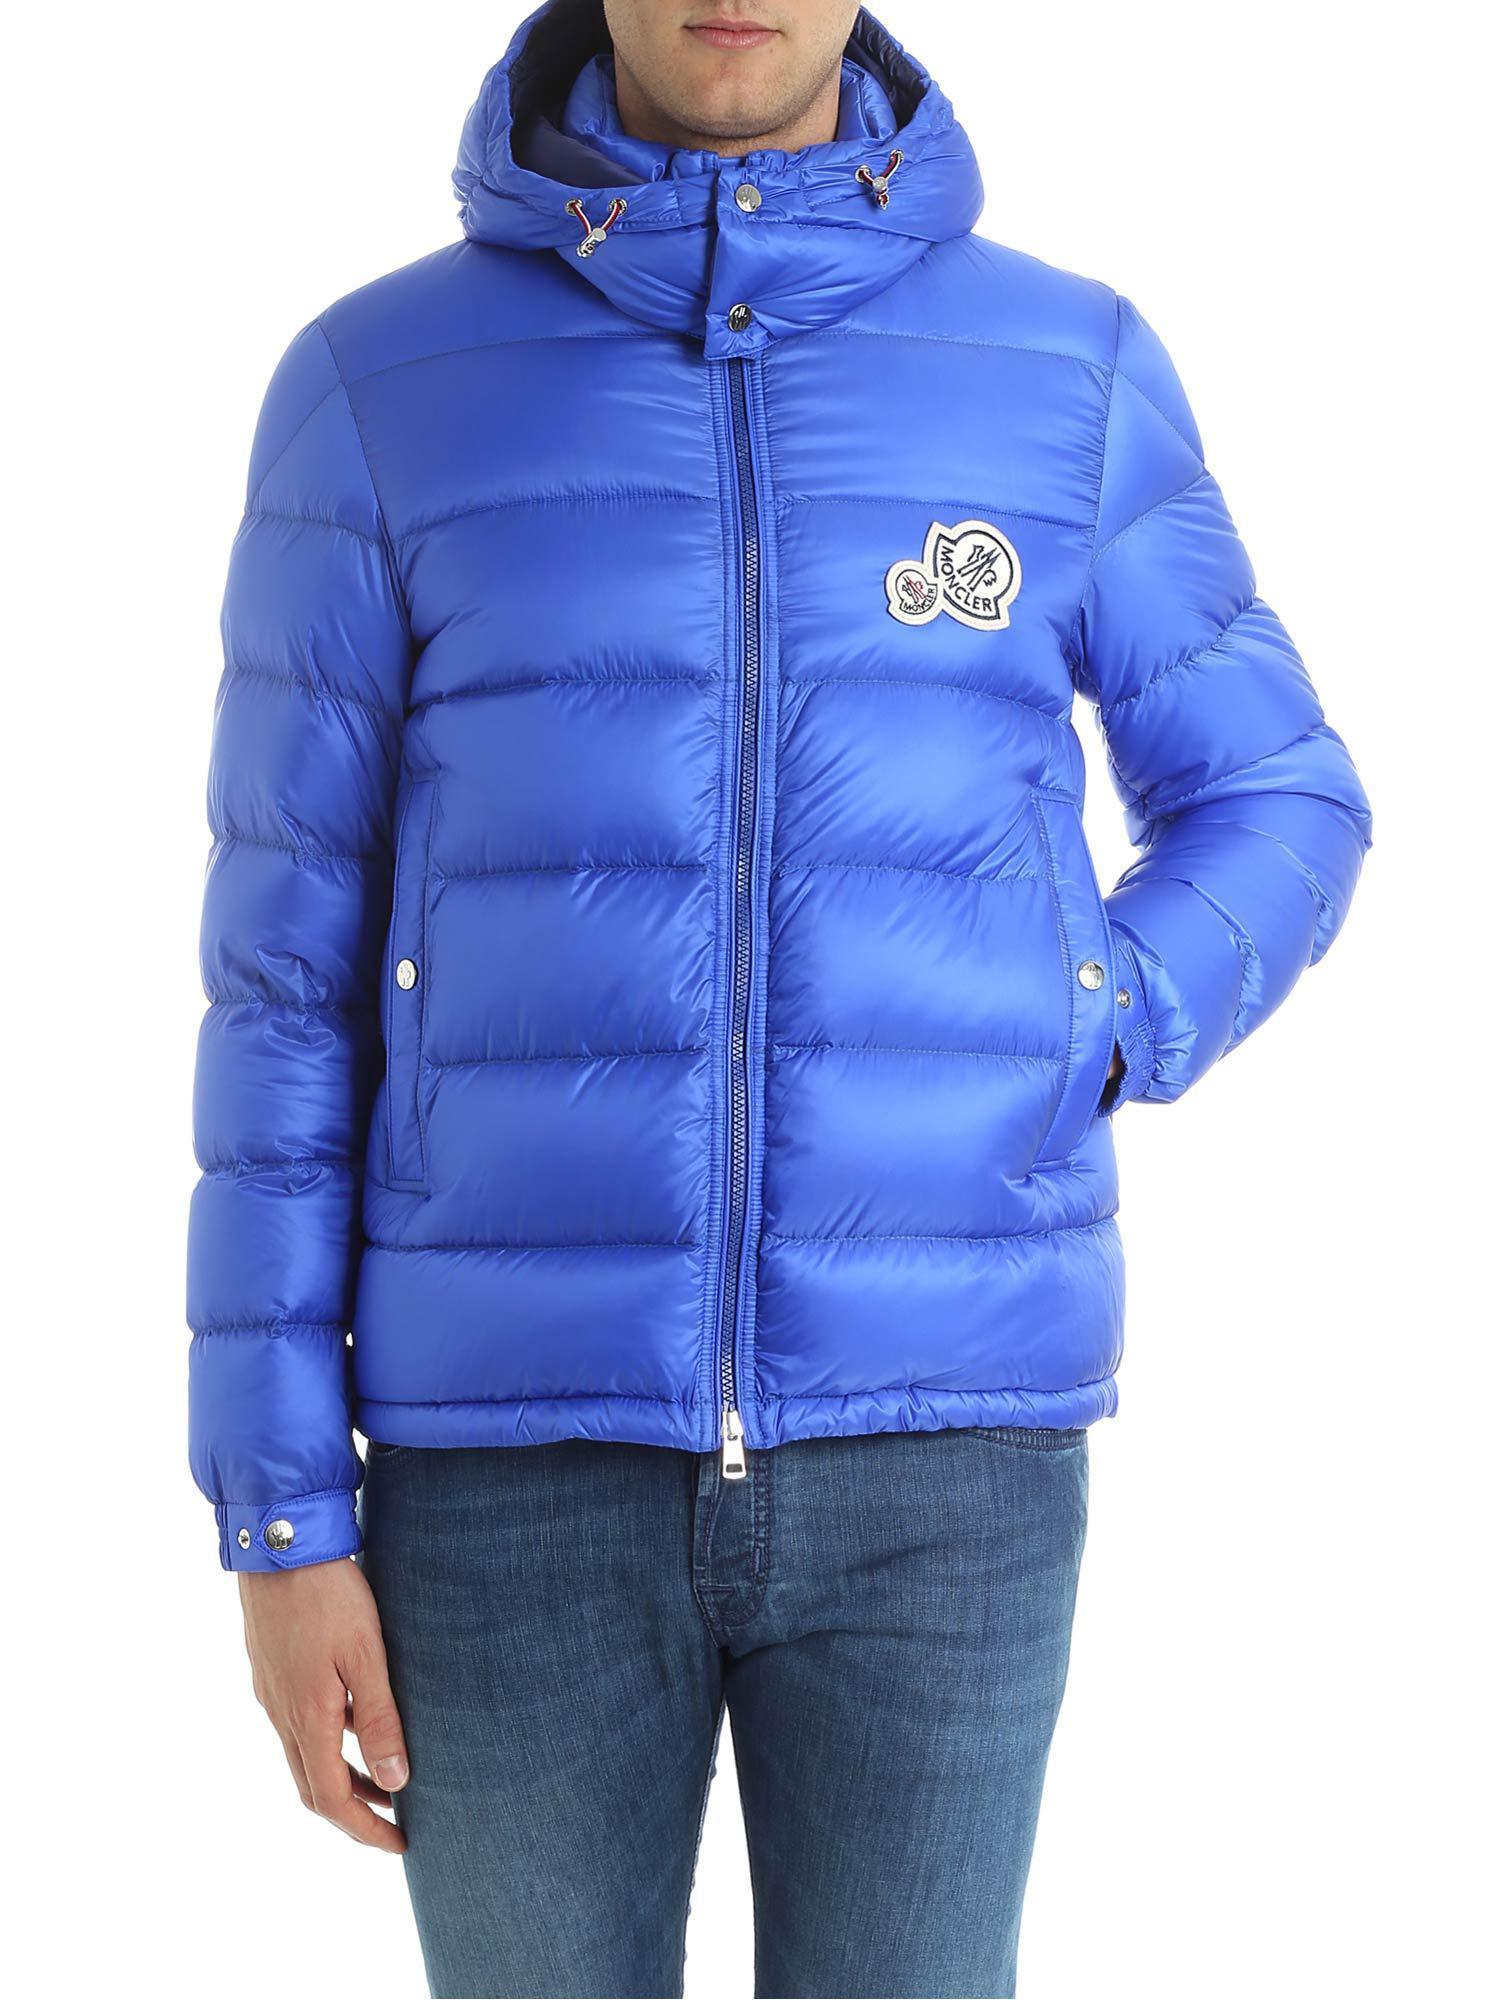 9e08e1adc canada moncler jacket lyst uk 7bb8a 0fe2a